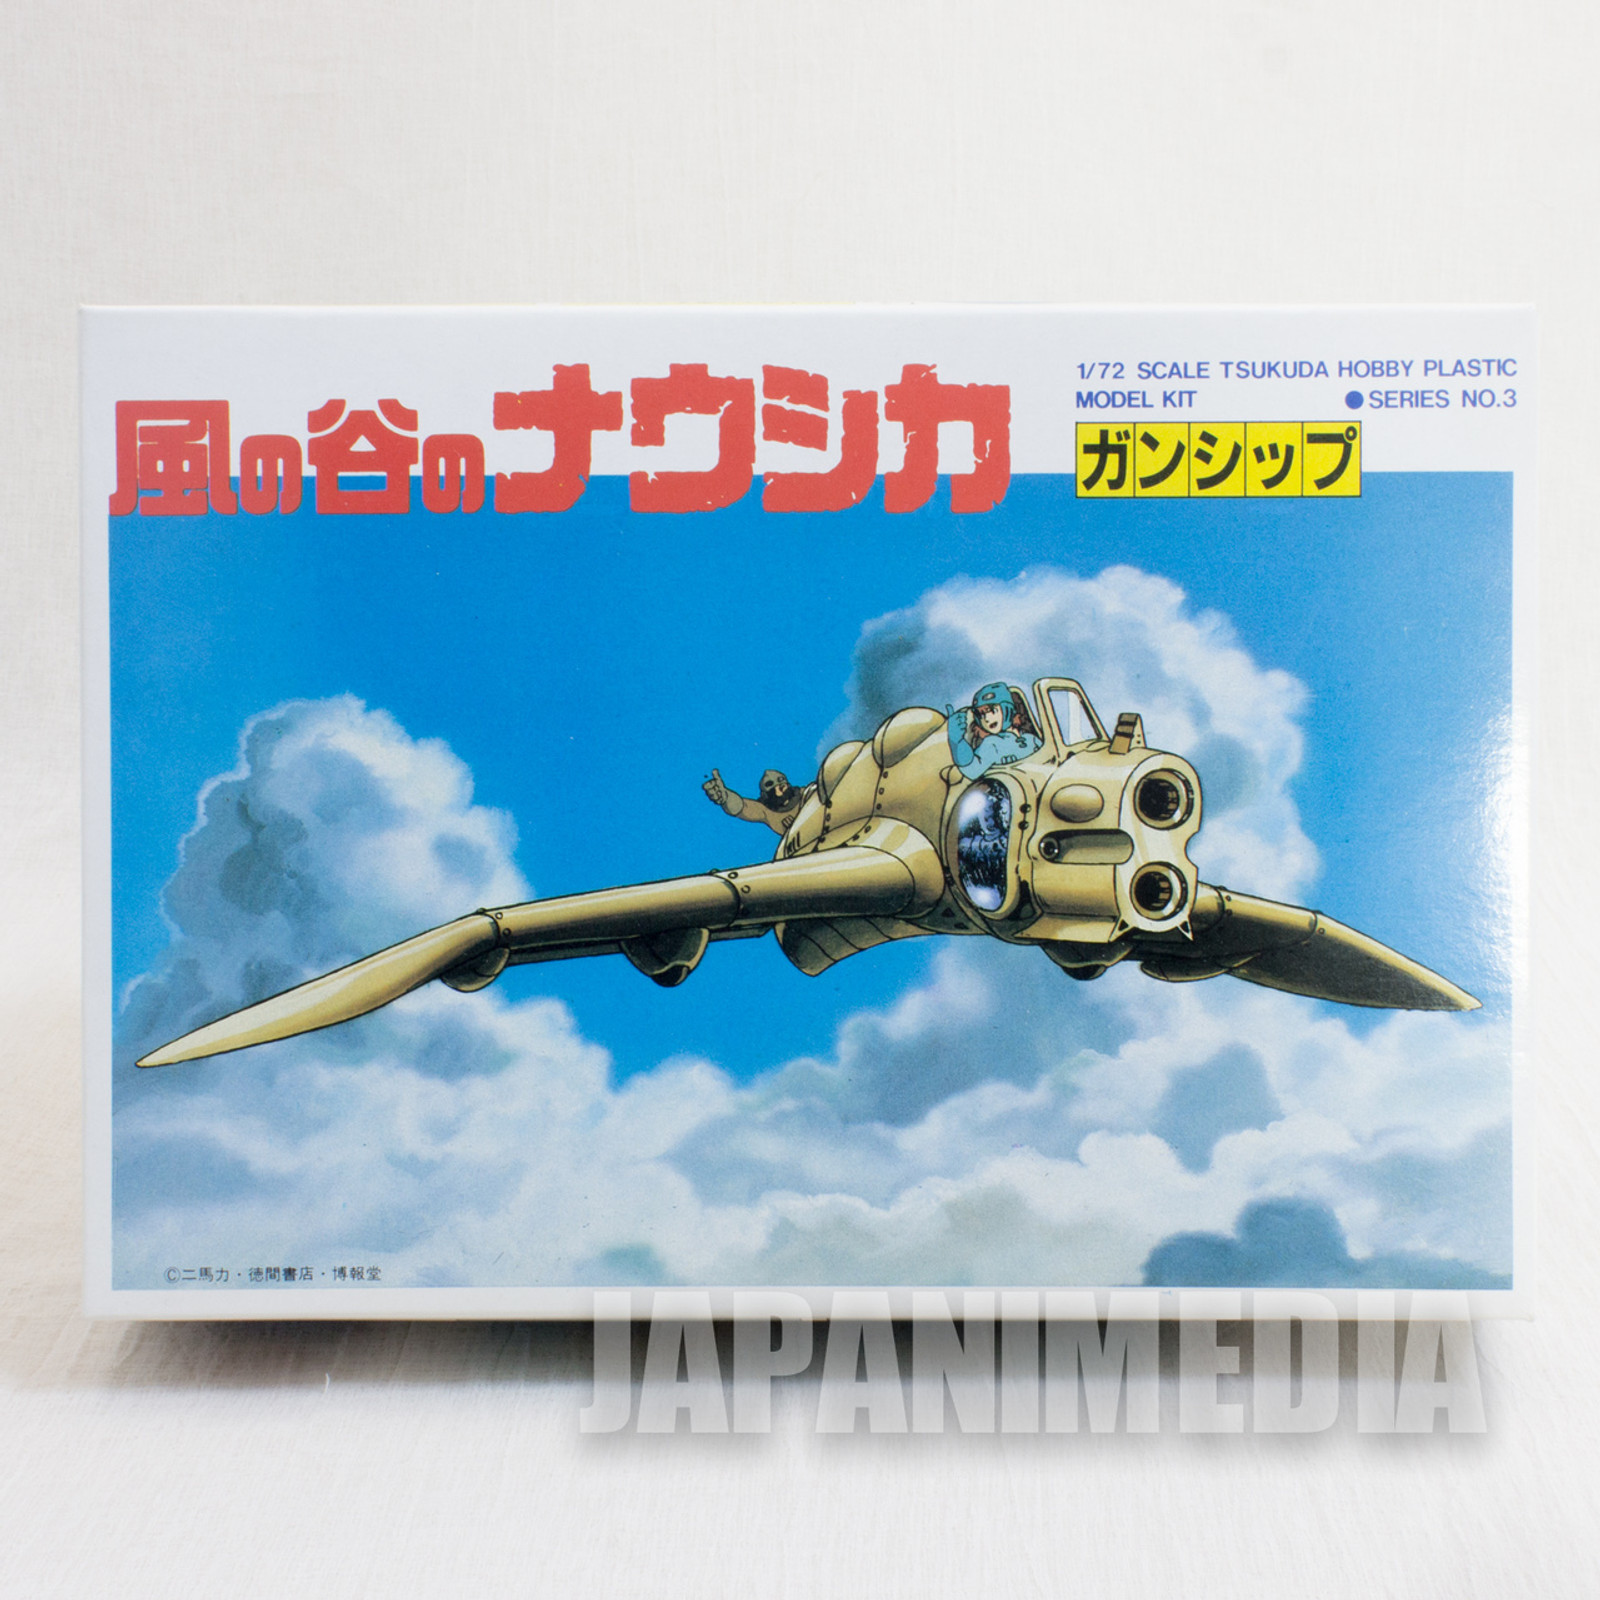 Nausicaa of Valley of Wind GUN SHIP Plastic Model Kit Ghibli Tsukuda Hobby